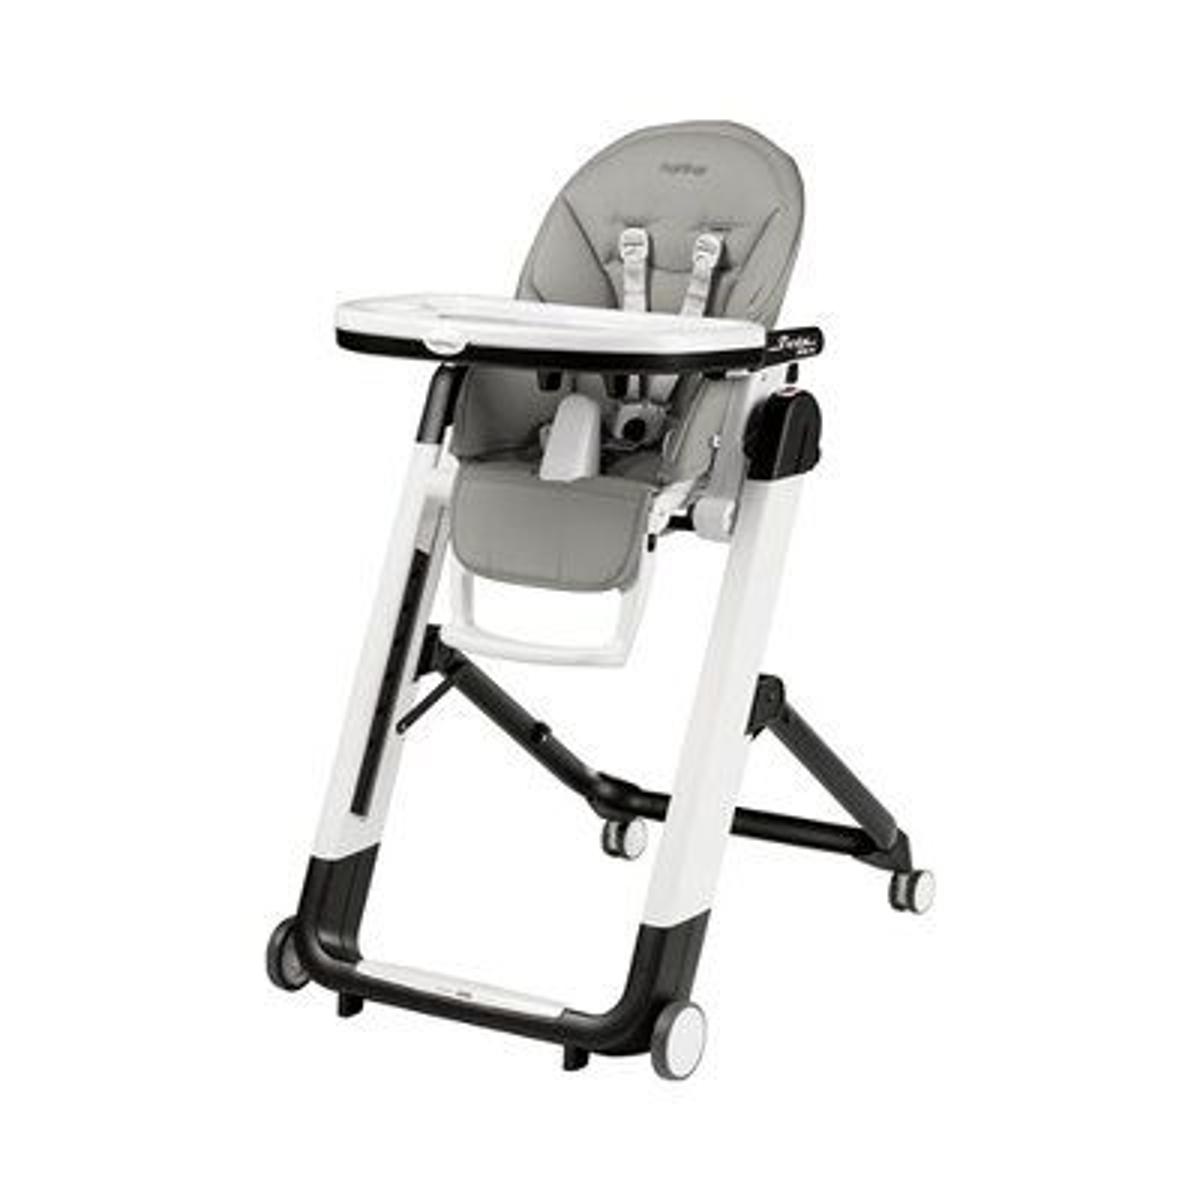 PEG-PÉREGO Chaise haute Siesta Follow Me chaise bébé